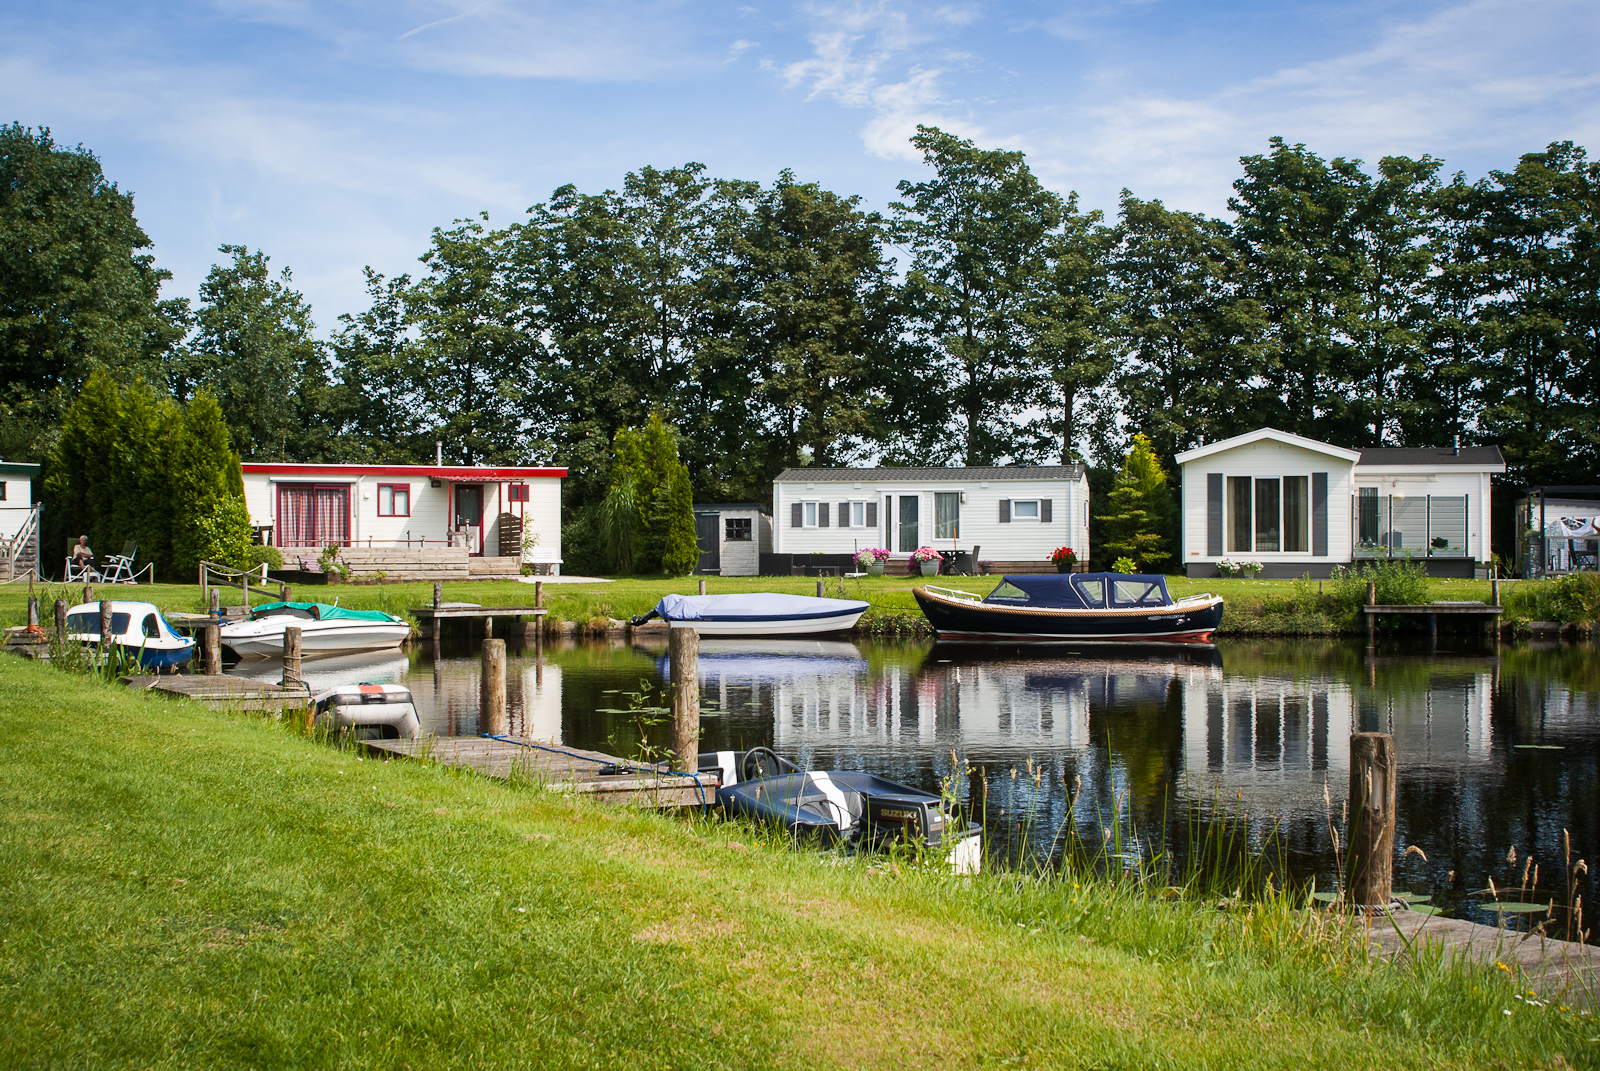 Camping+Kuikhorne+15-08-2012-17